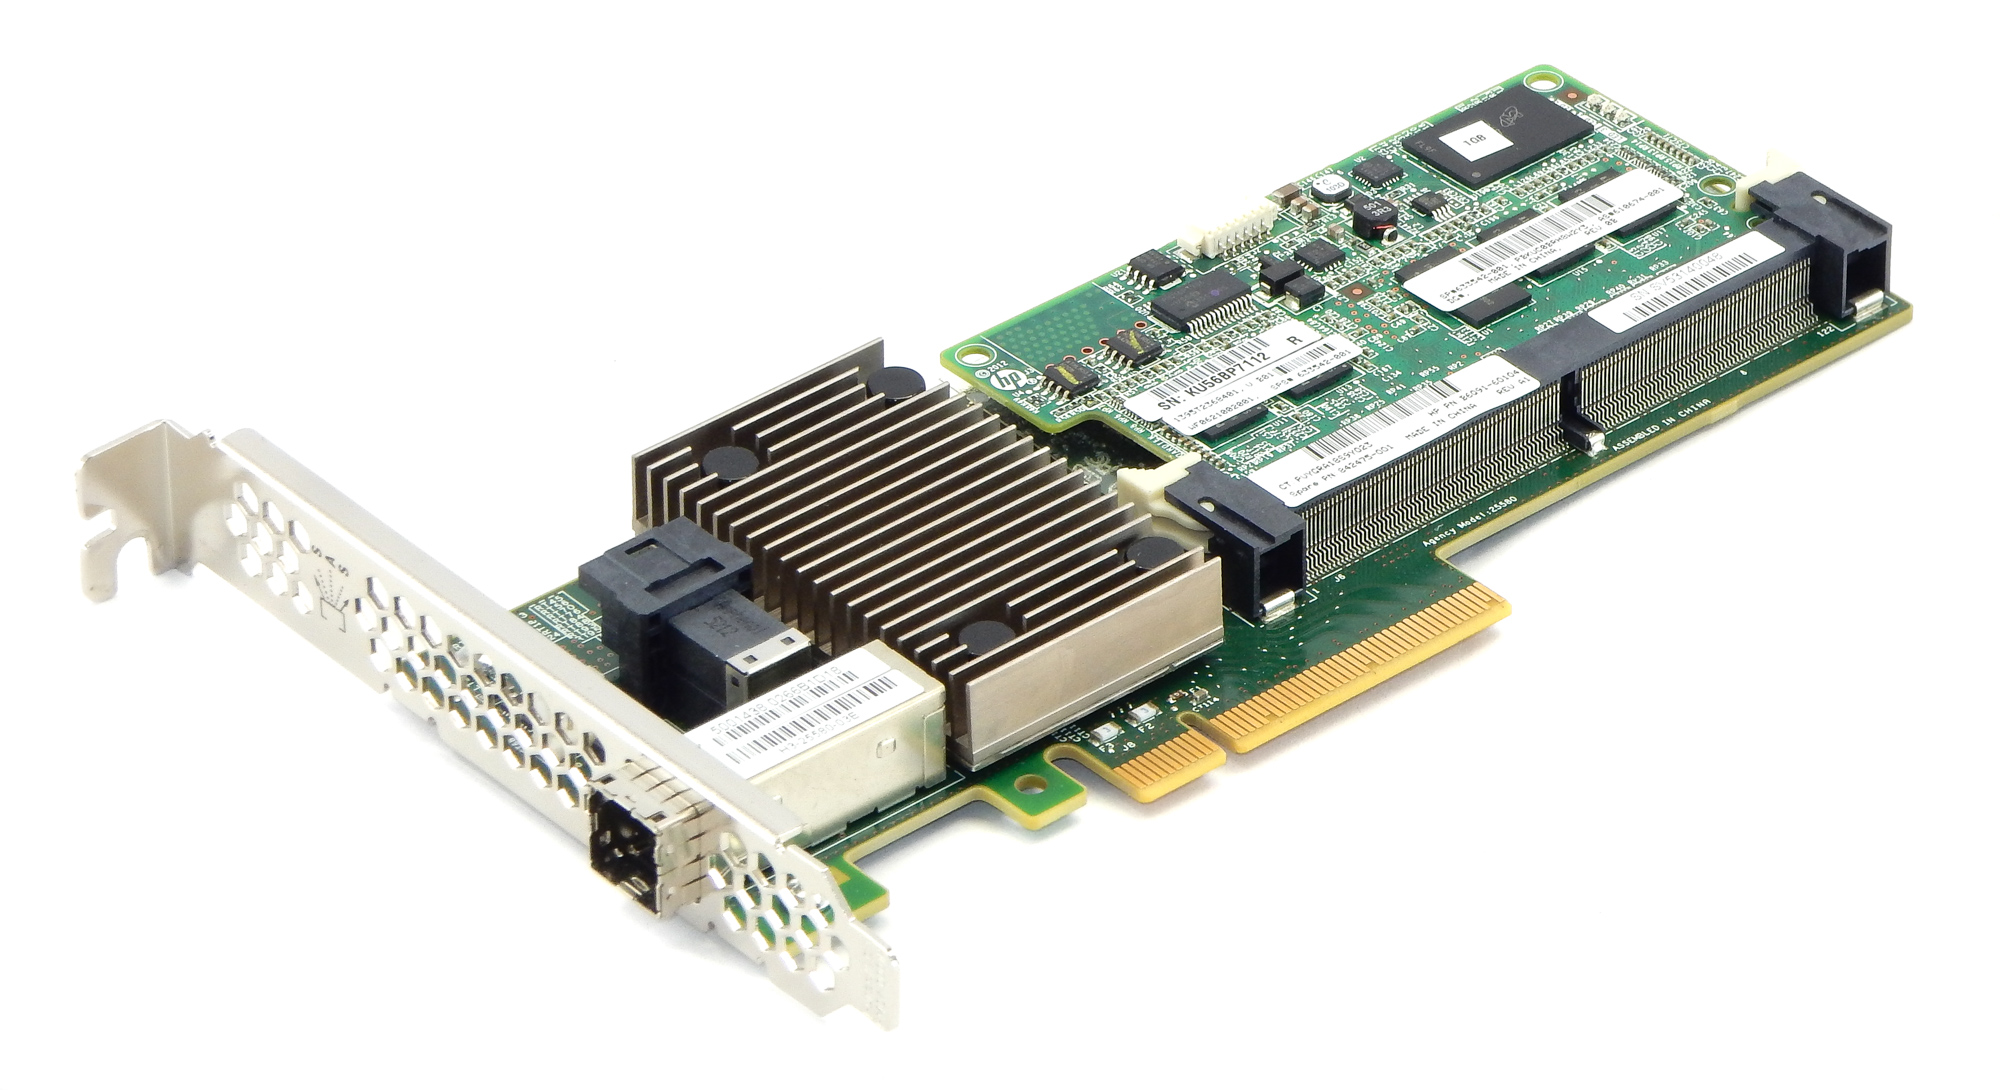 Hp 842475-001 Pca 4e/4i PCI-e X8 Network Card f/ HP StoreOnce 2700 w/ 633542-001